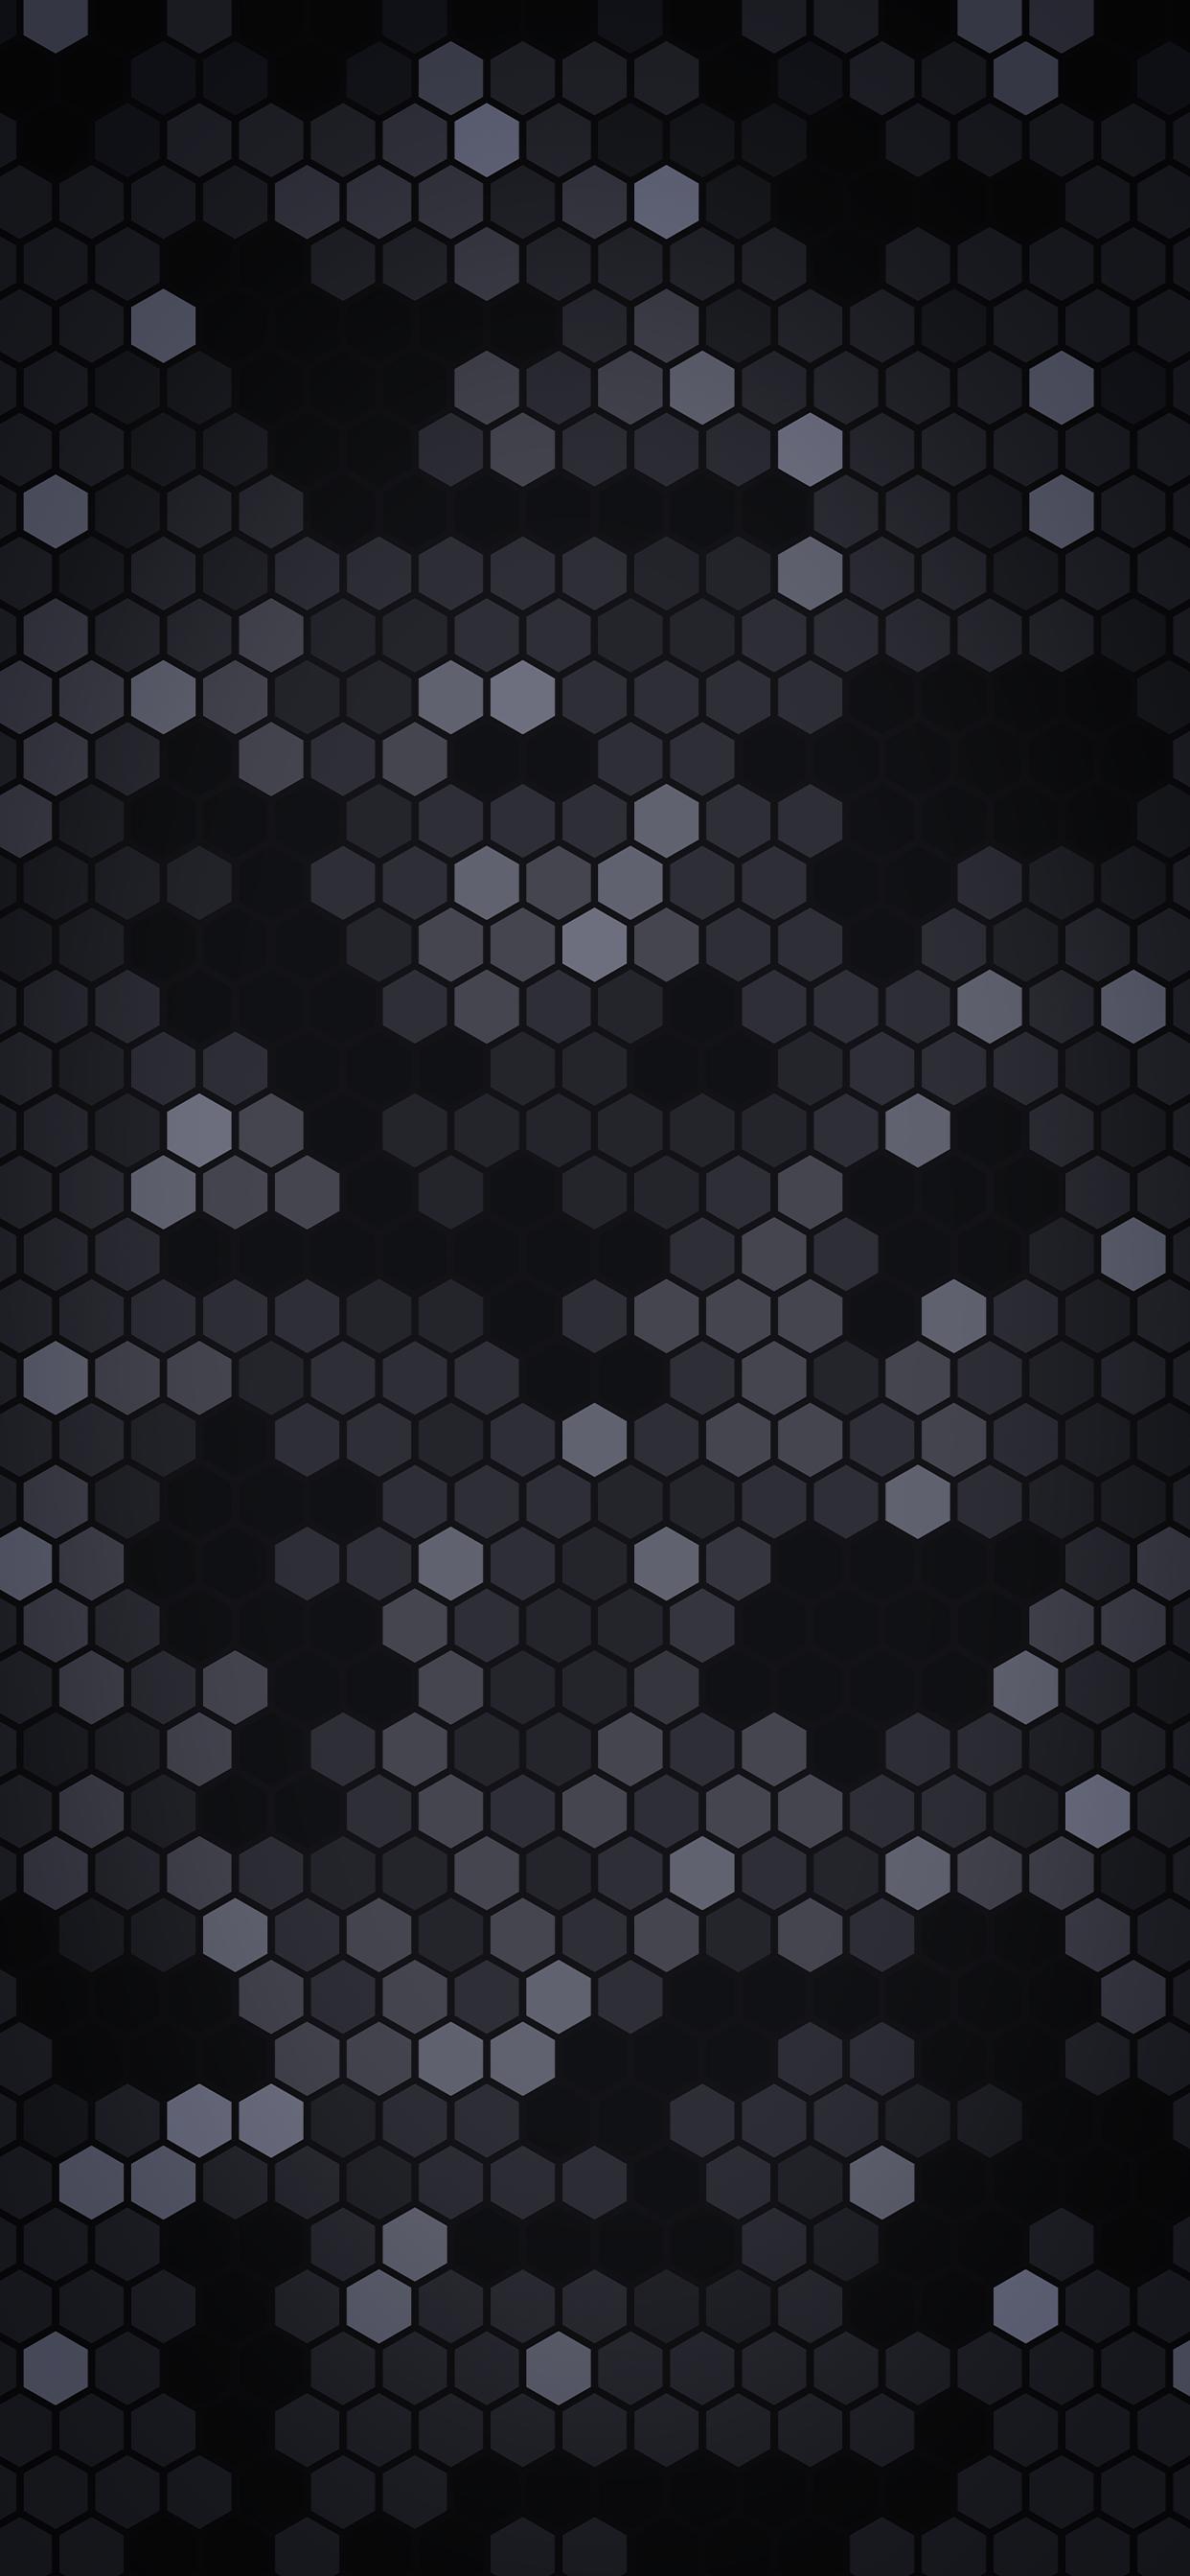 Pin By Starkim On Wallpaper Iphone Lockscreen Wallpaper Iphone Homescreen Wallpaper Iphone Wallpaper